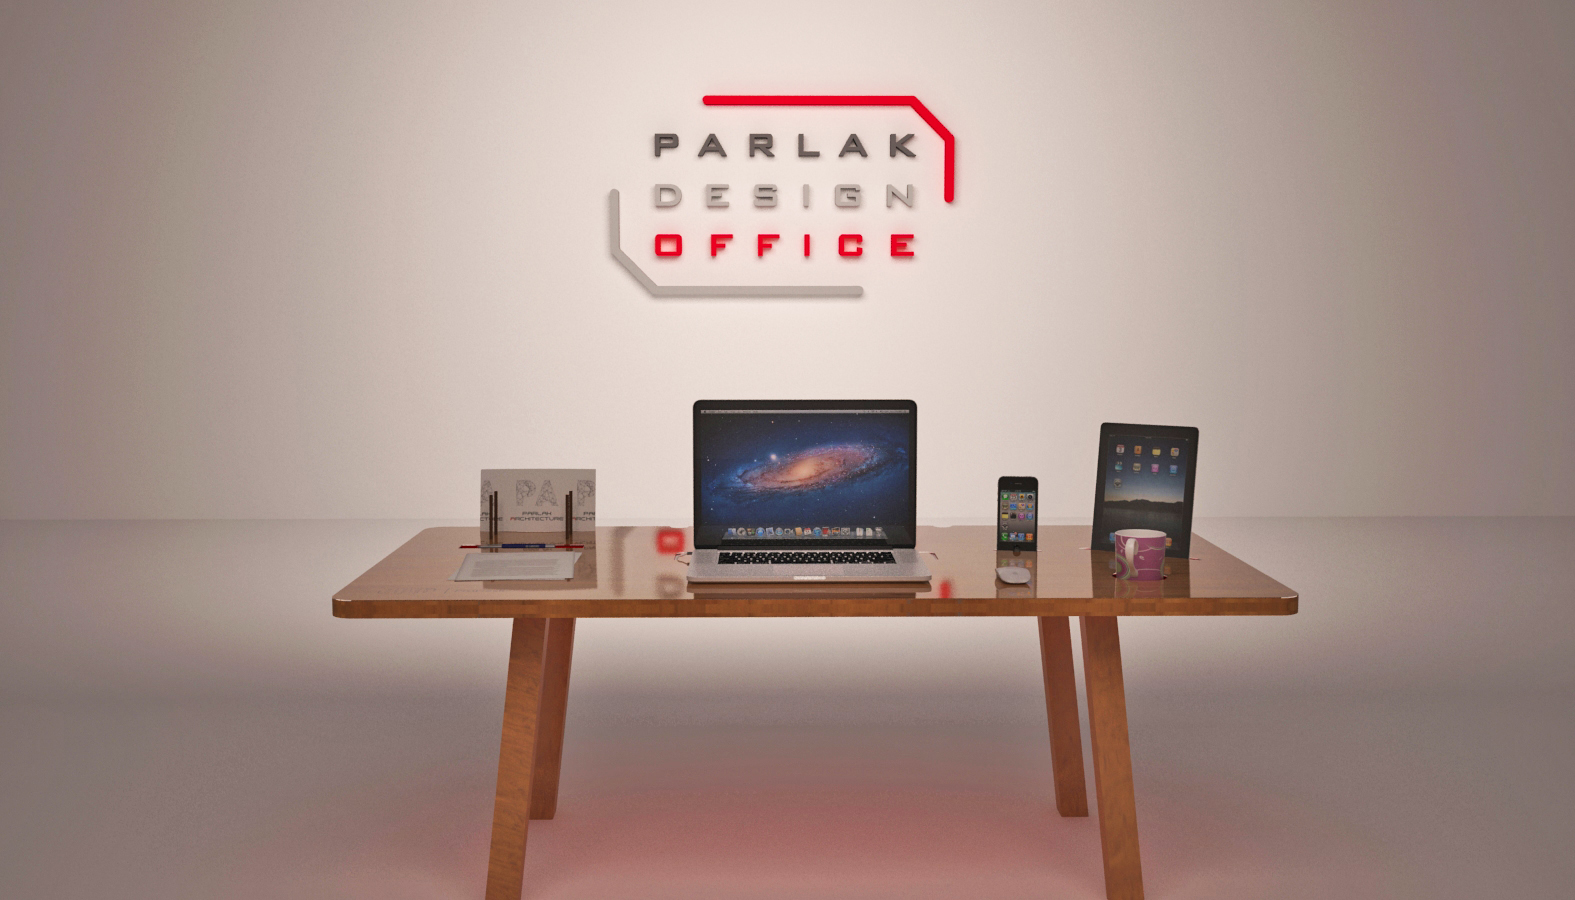 ProDesk - Parlak Design Office